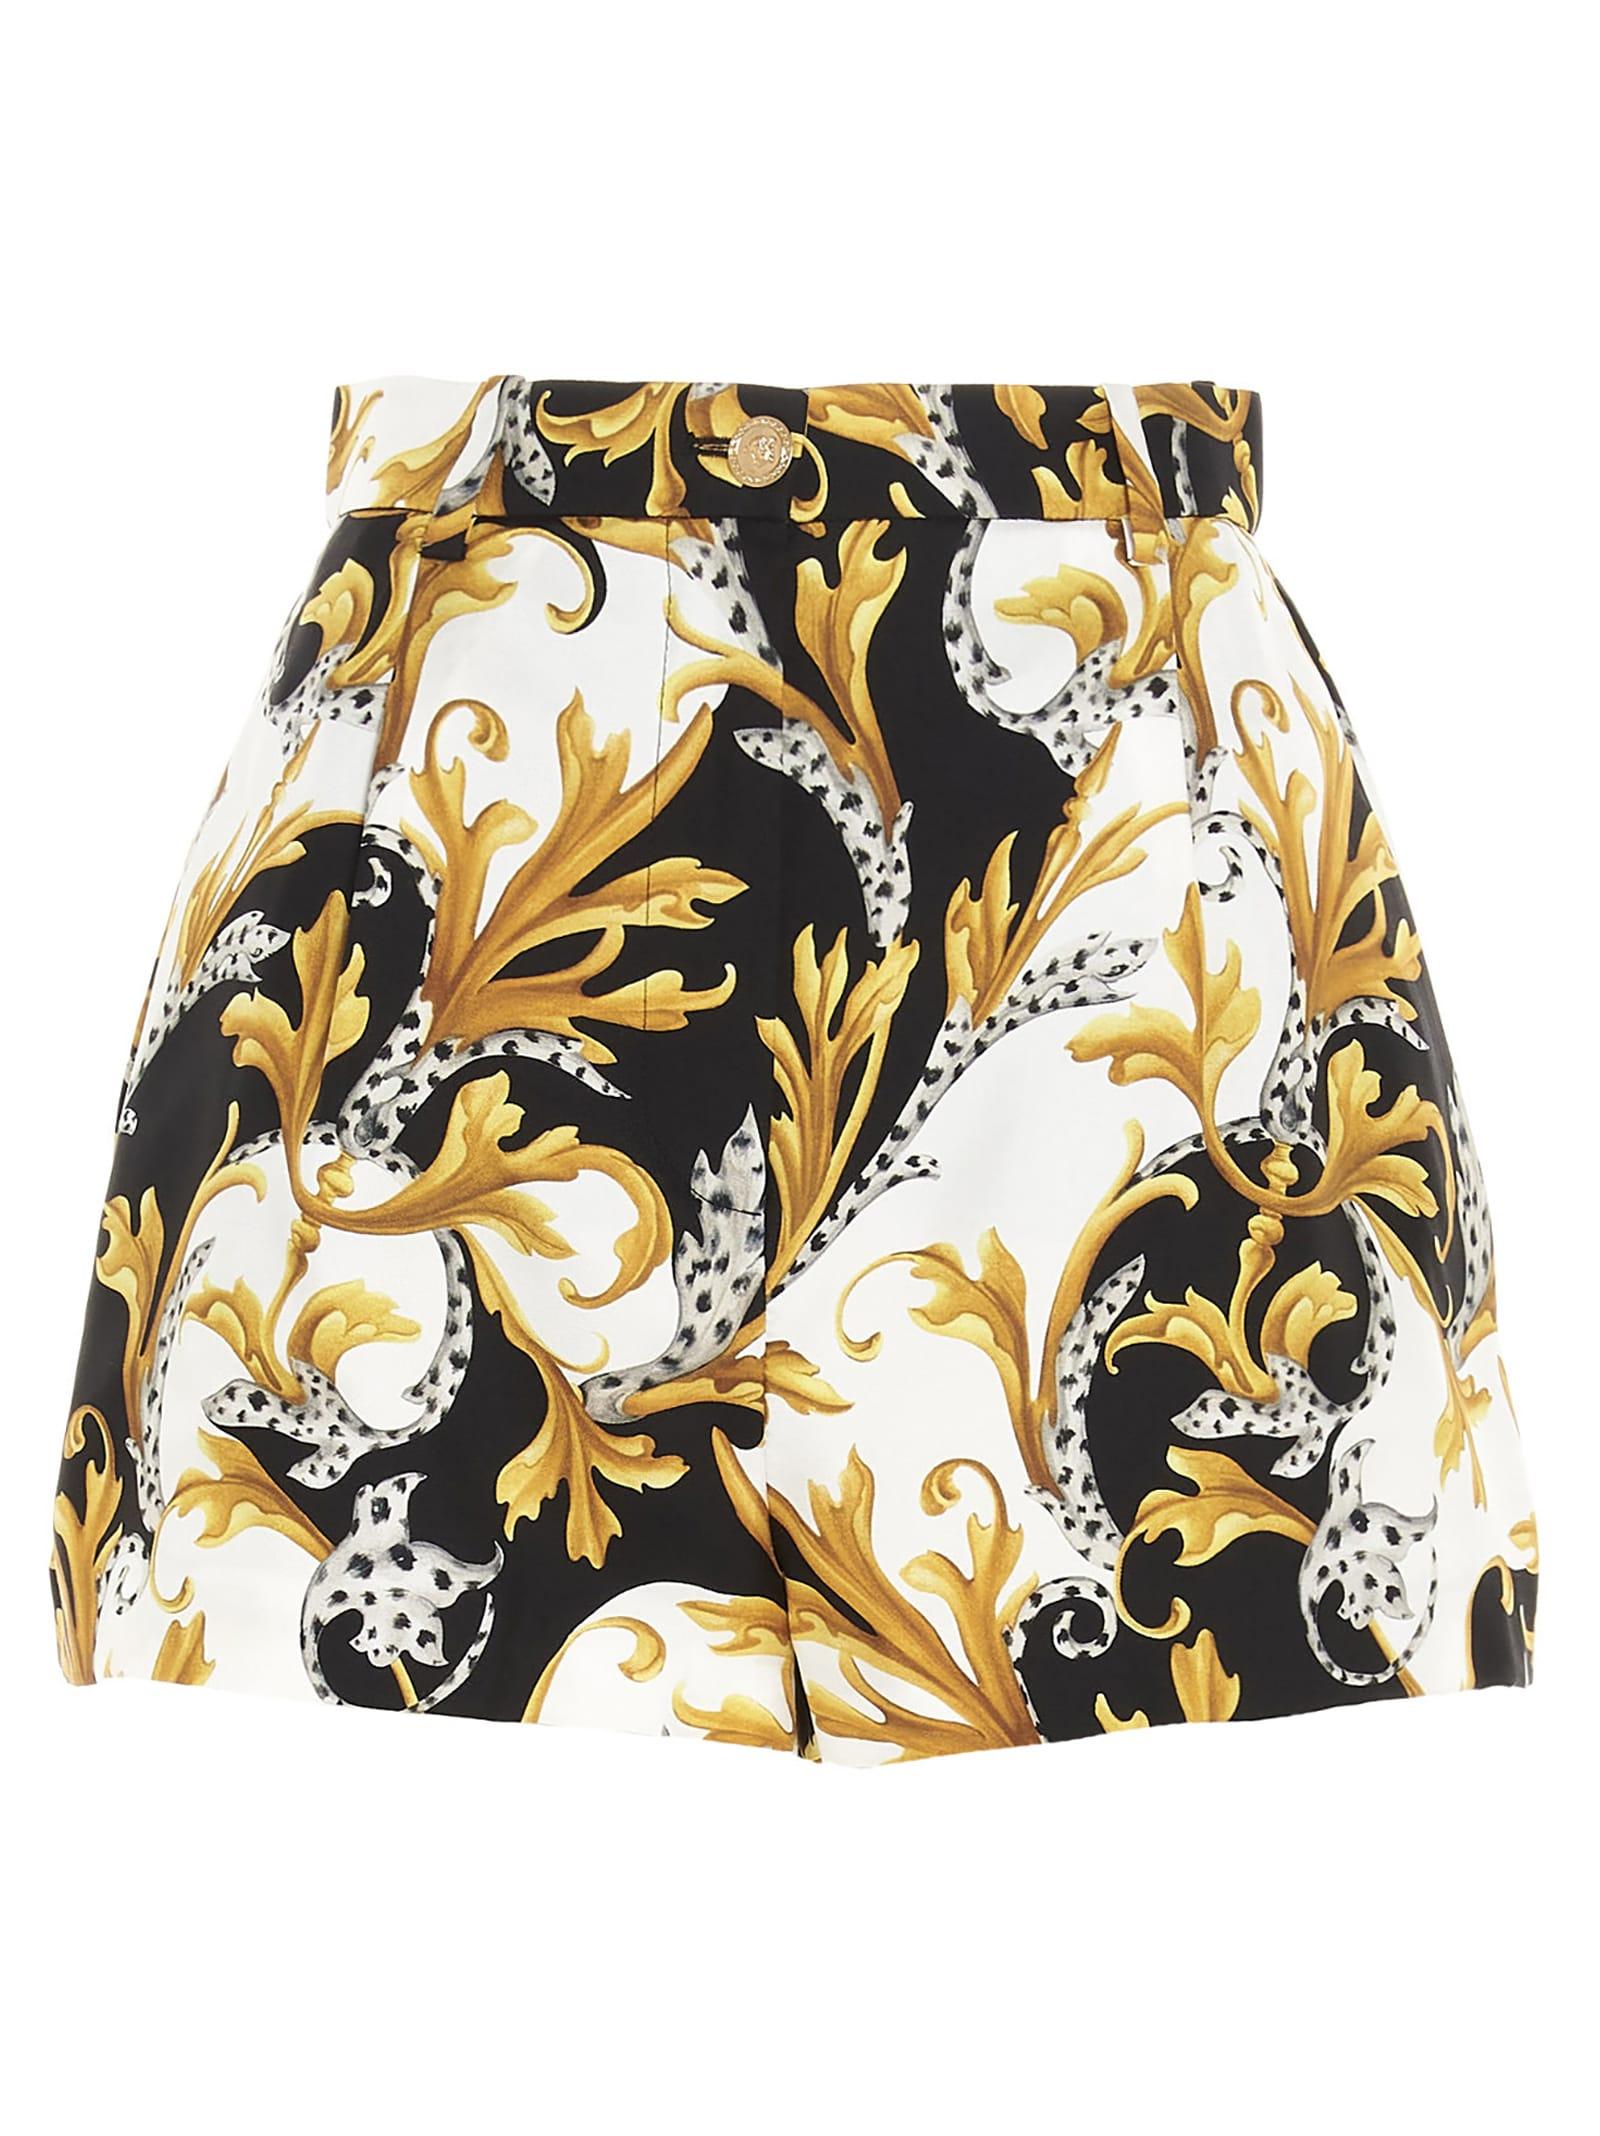 Versace barocco Shorts